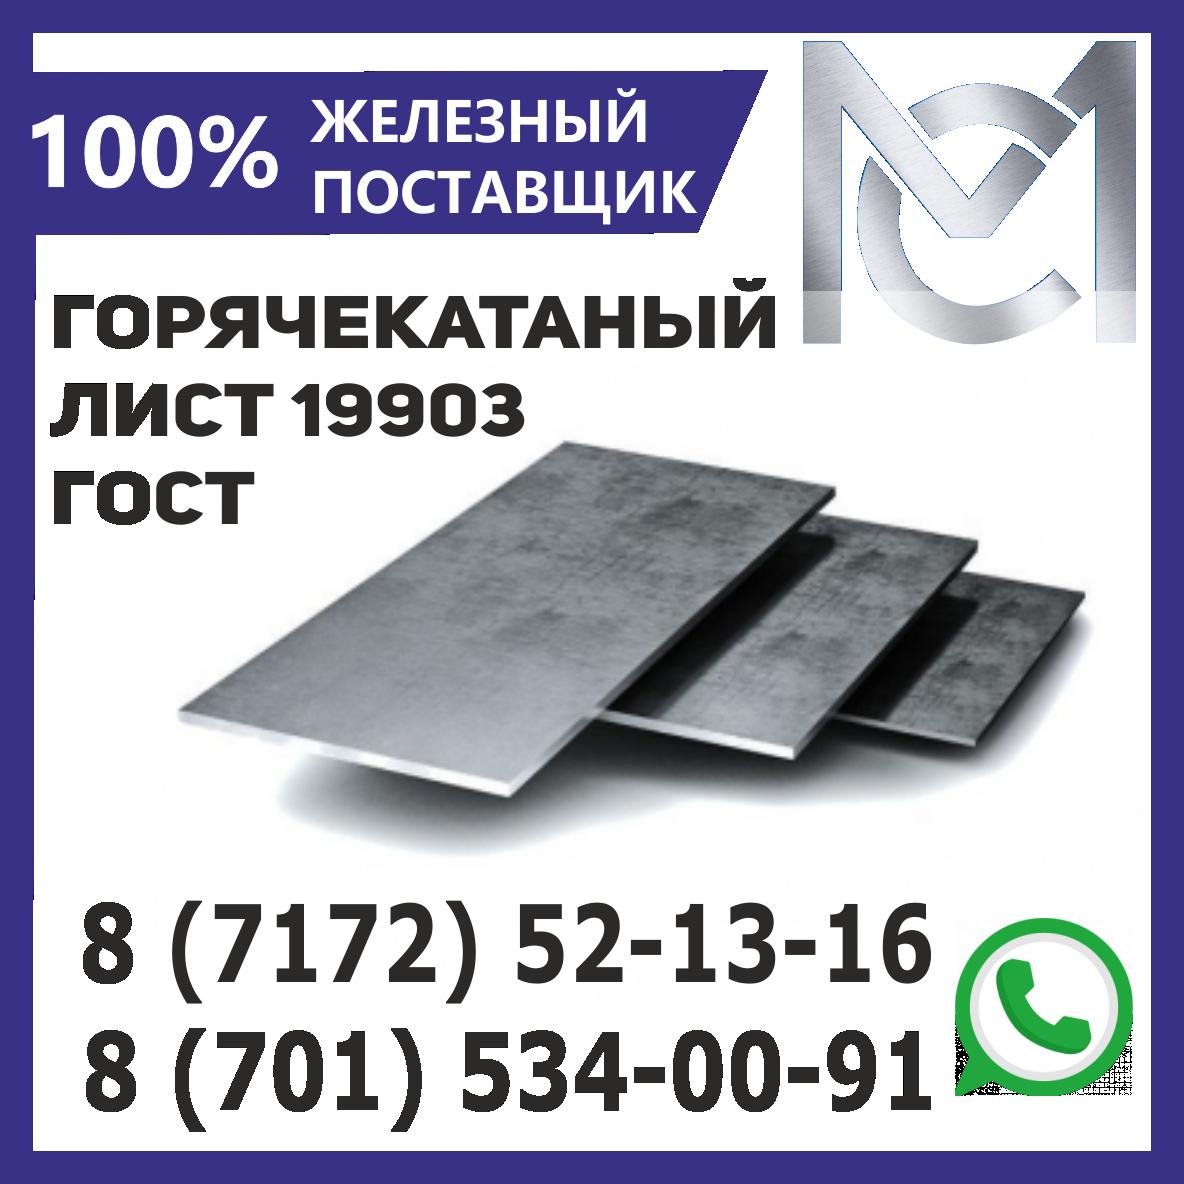 Лист 50 горячекатаный ГОСТ 19903-74, 1,5х6,0 м.